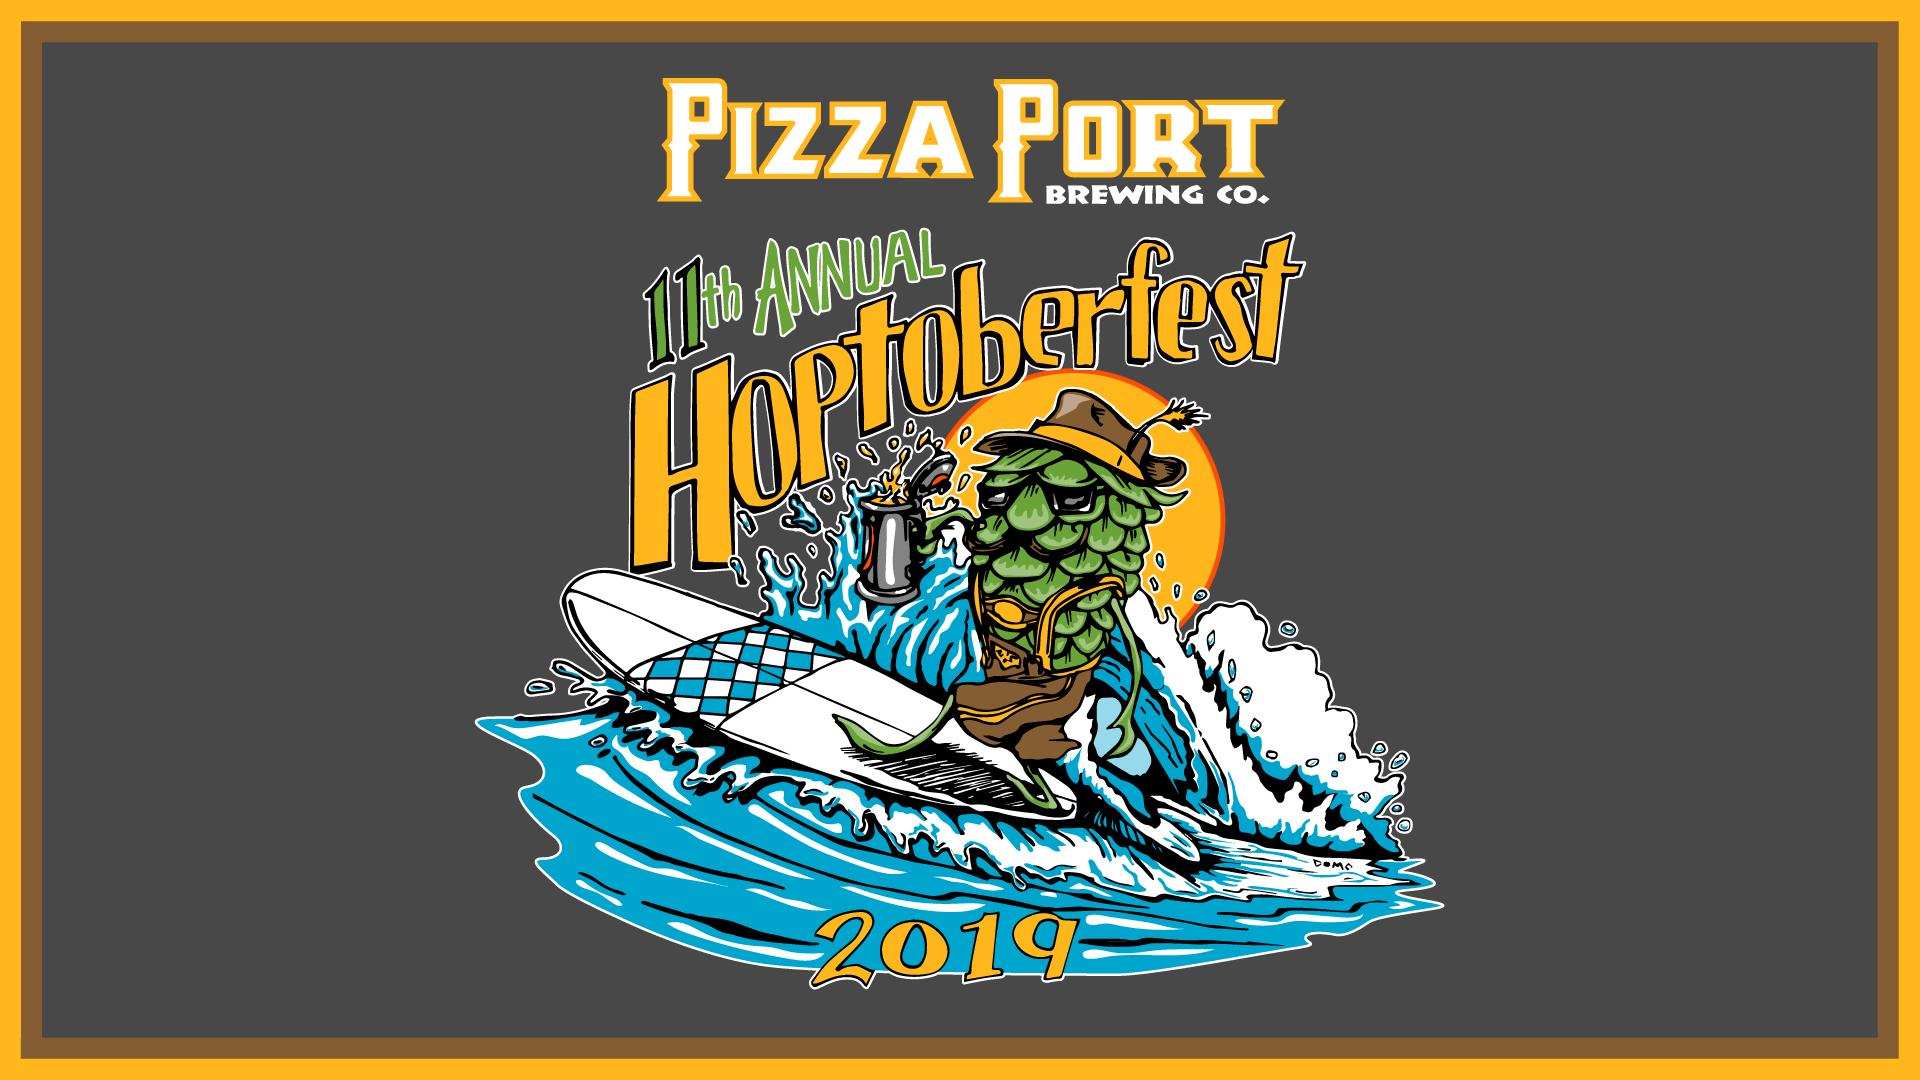 11th Annual Hoptoberfest